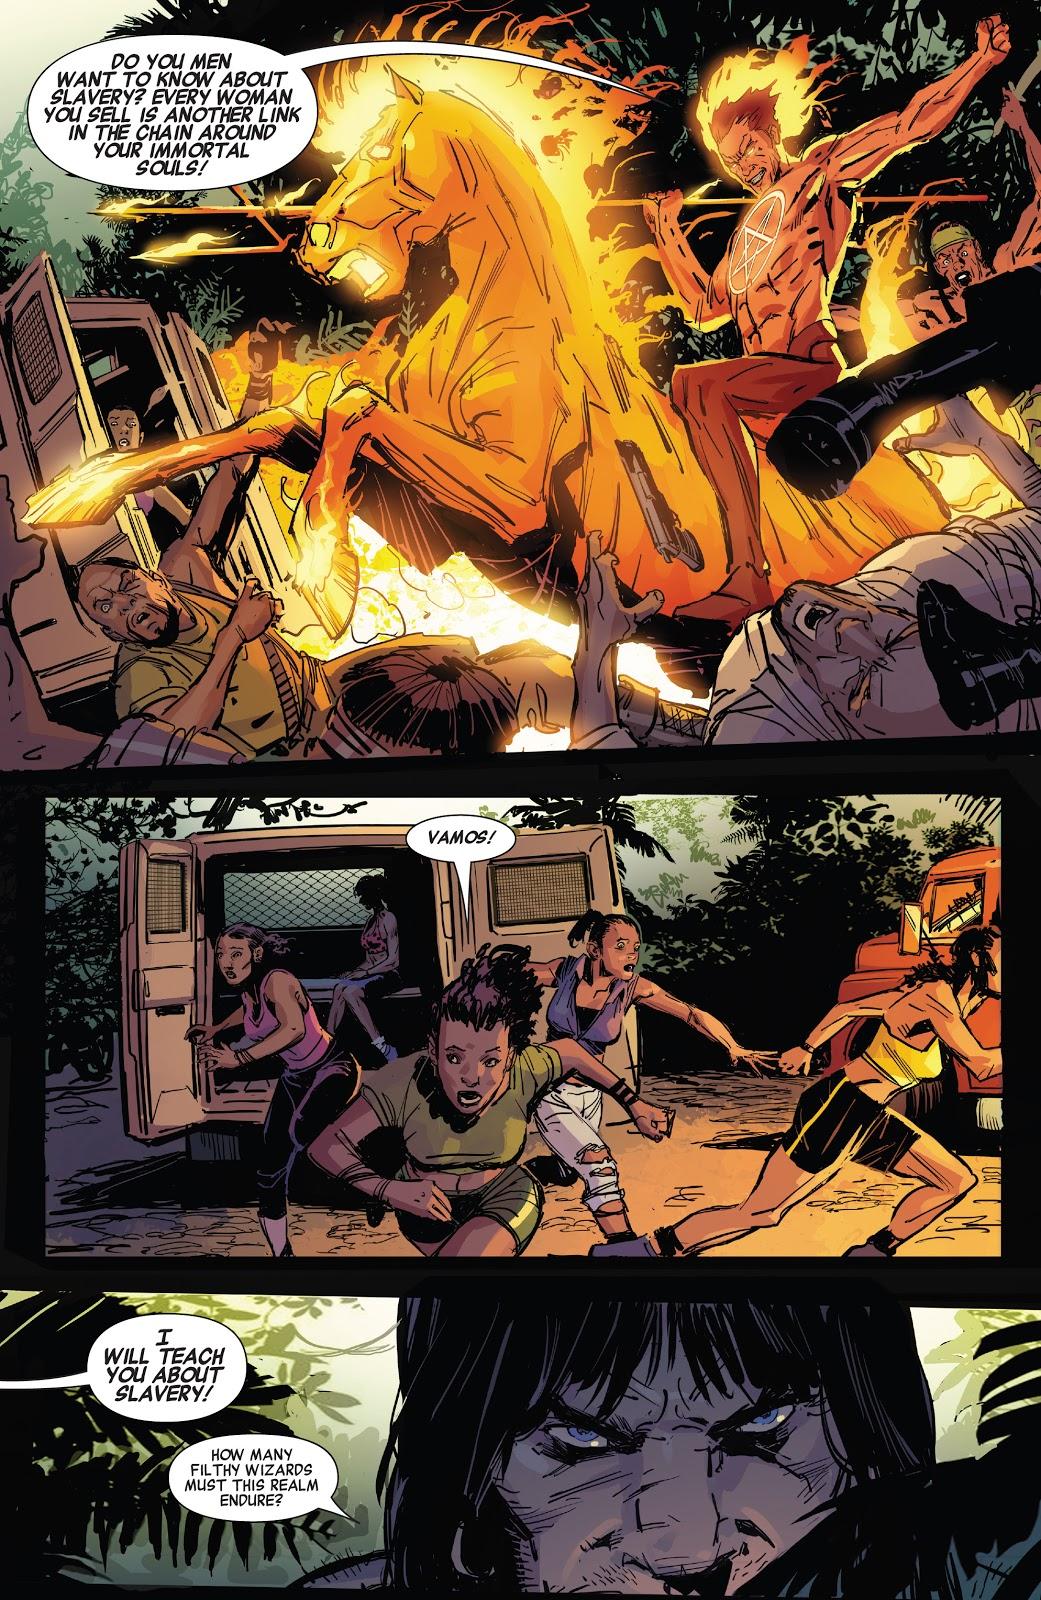 Daimon Hellstrome (Savage Avengers Annual #1)